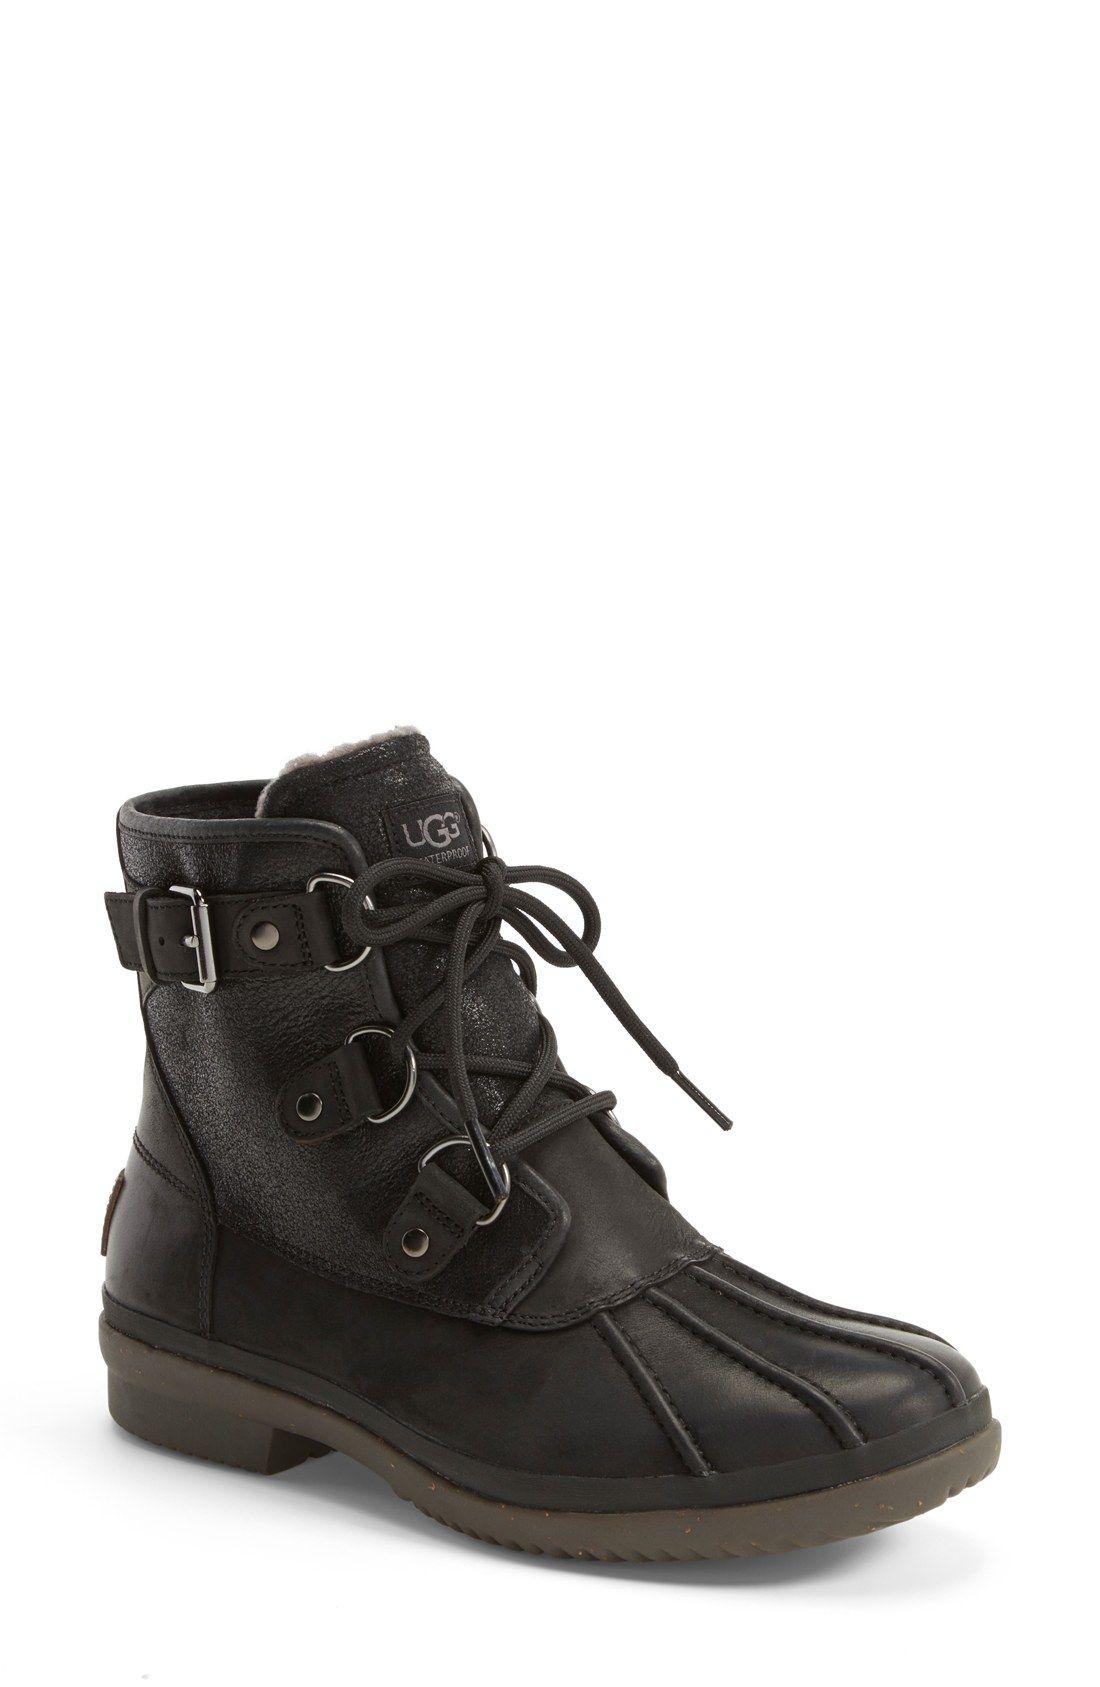 2cb4385bbcb UGG® Australia 'Cecile' Waterproof Boot (Women) 170 dollars tho ...